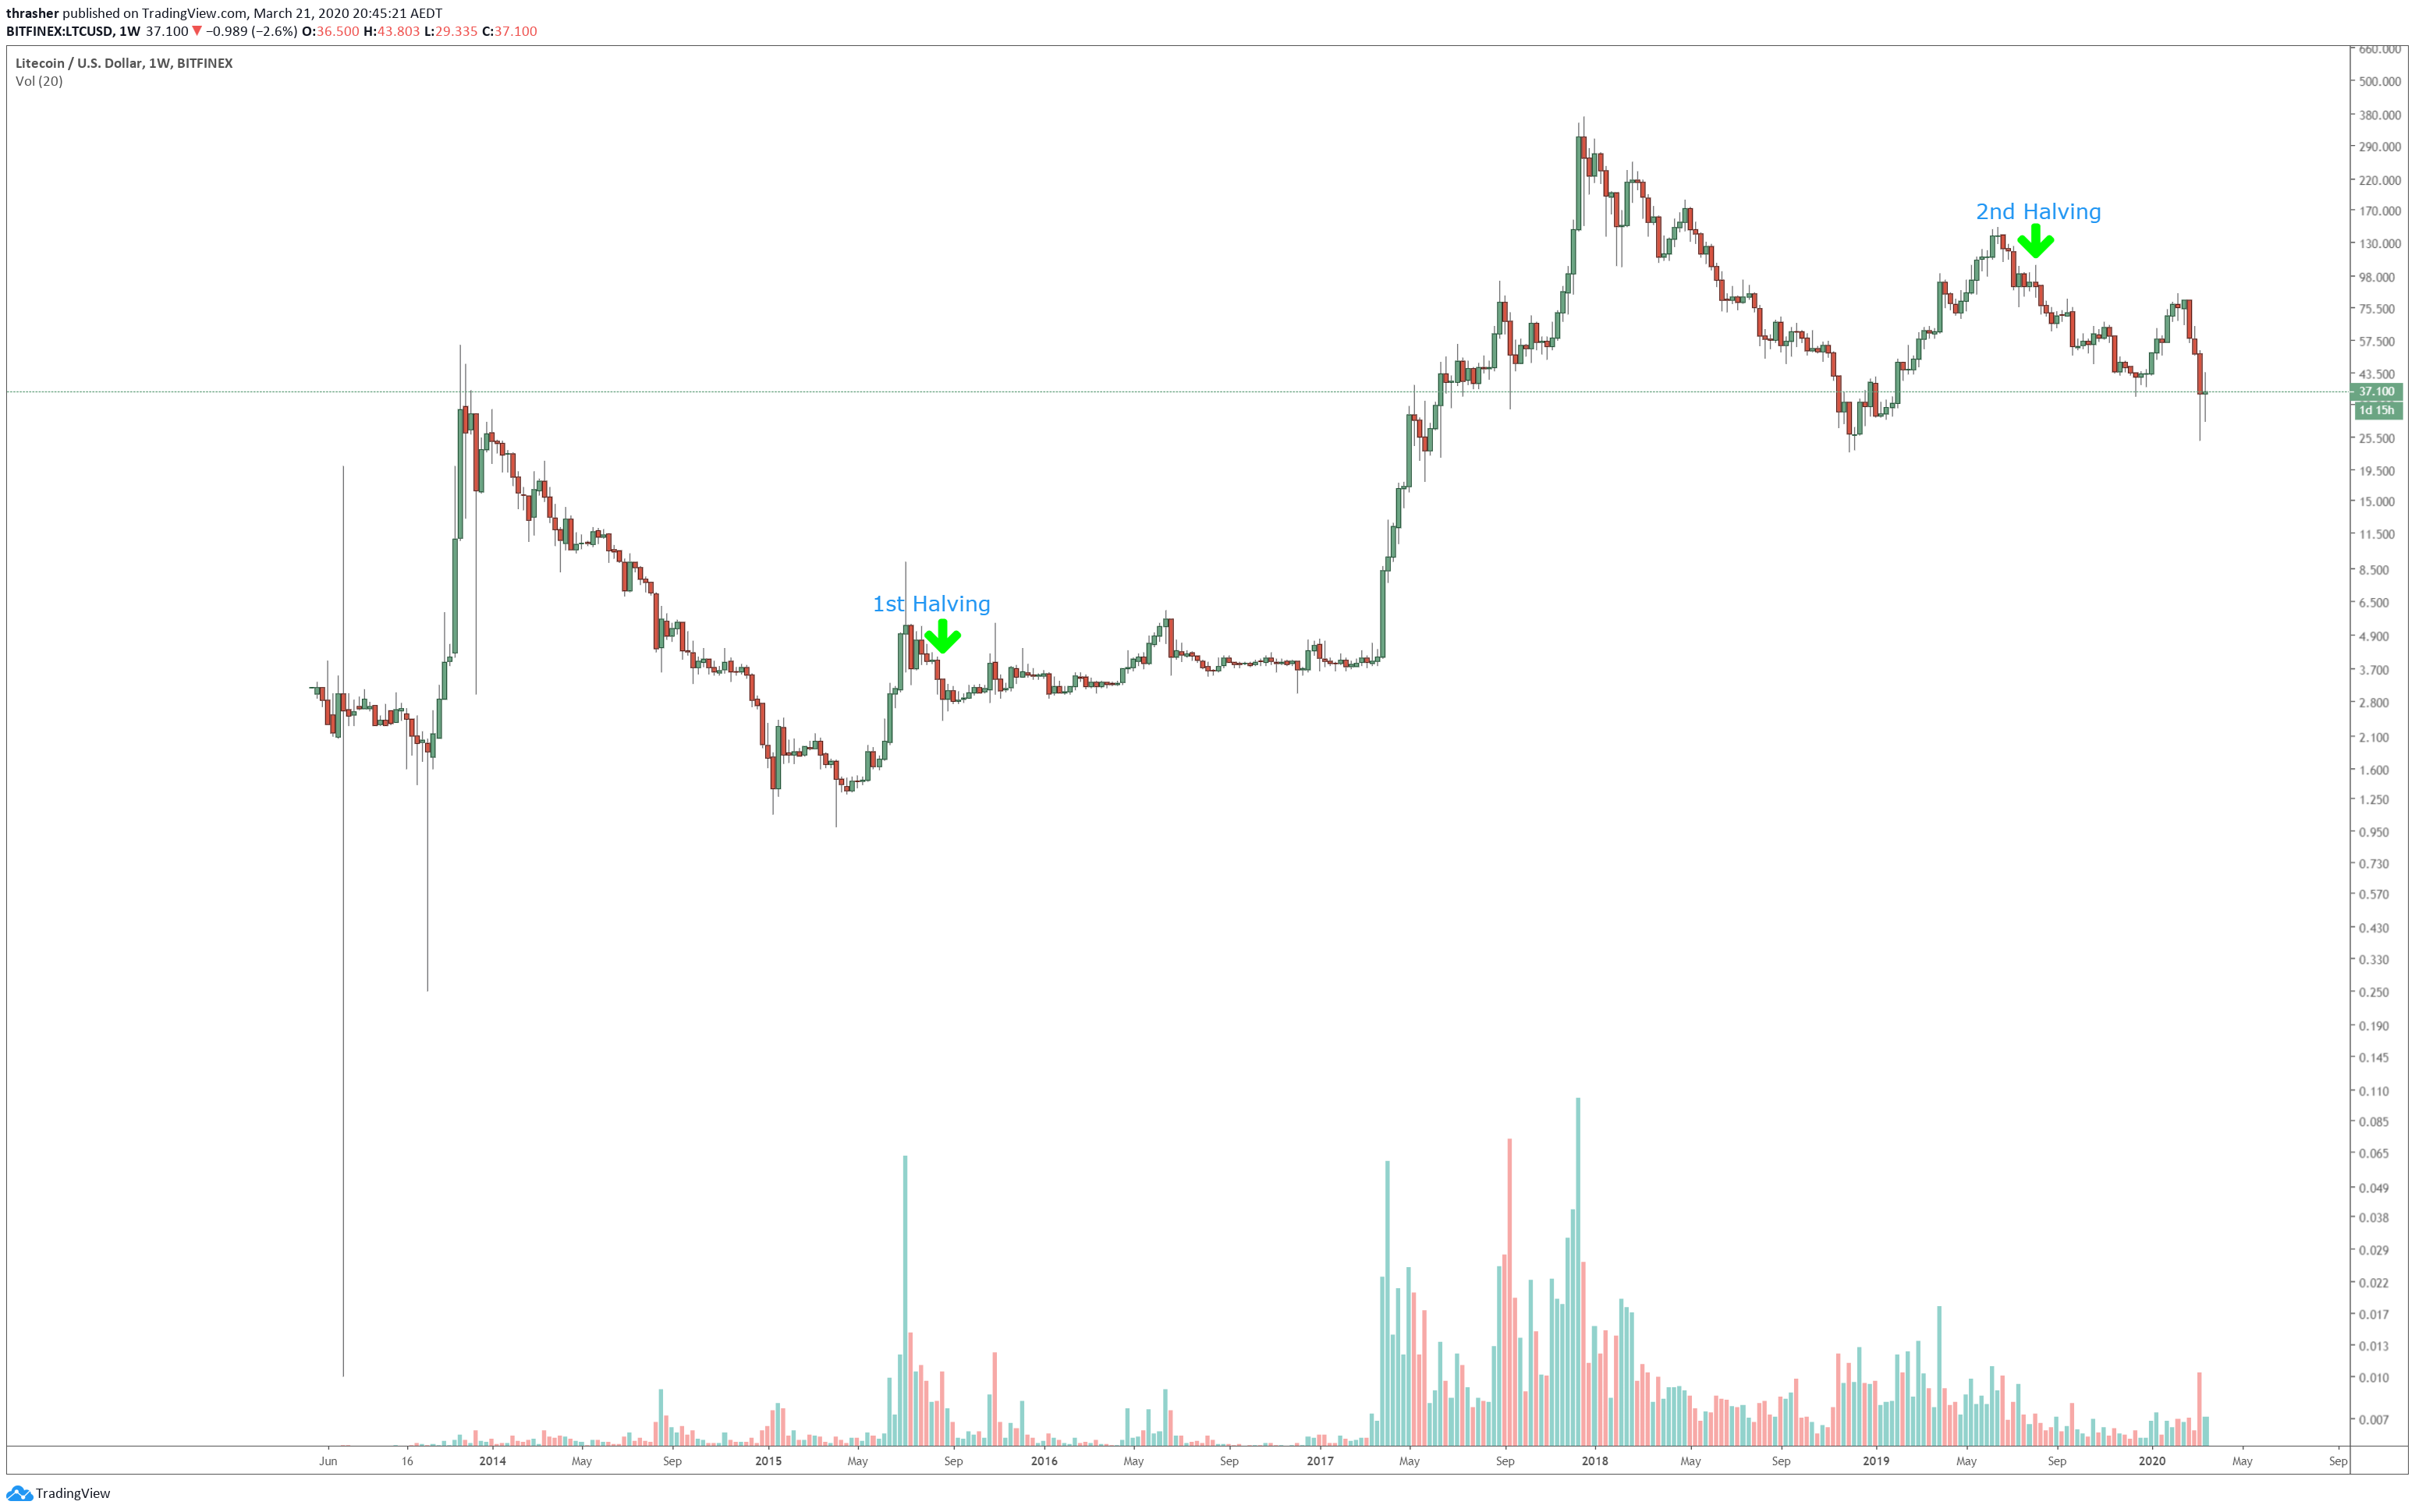 litecoin halving chart